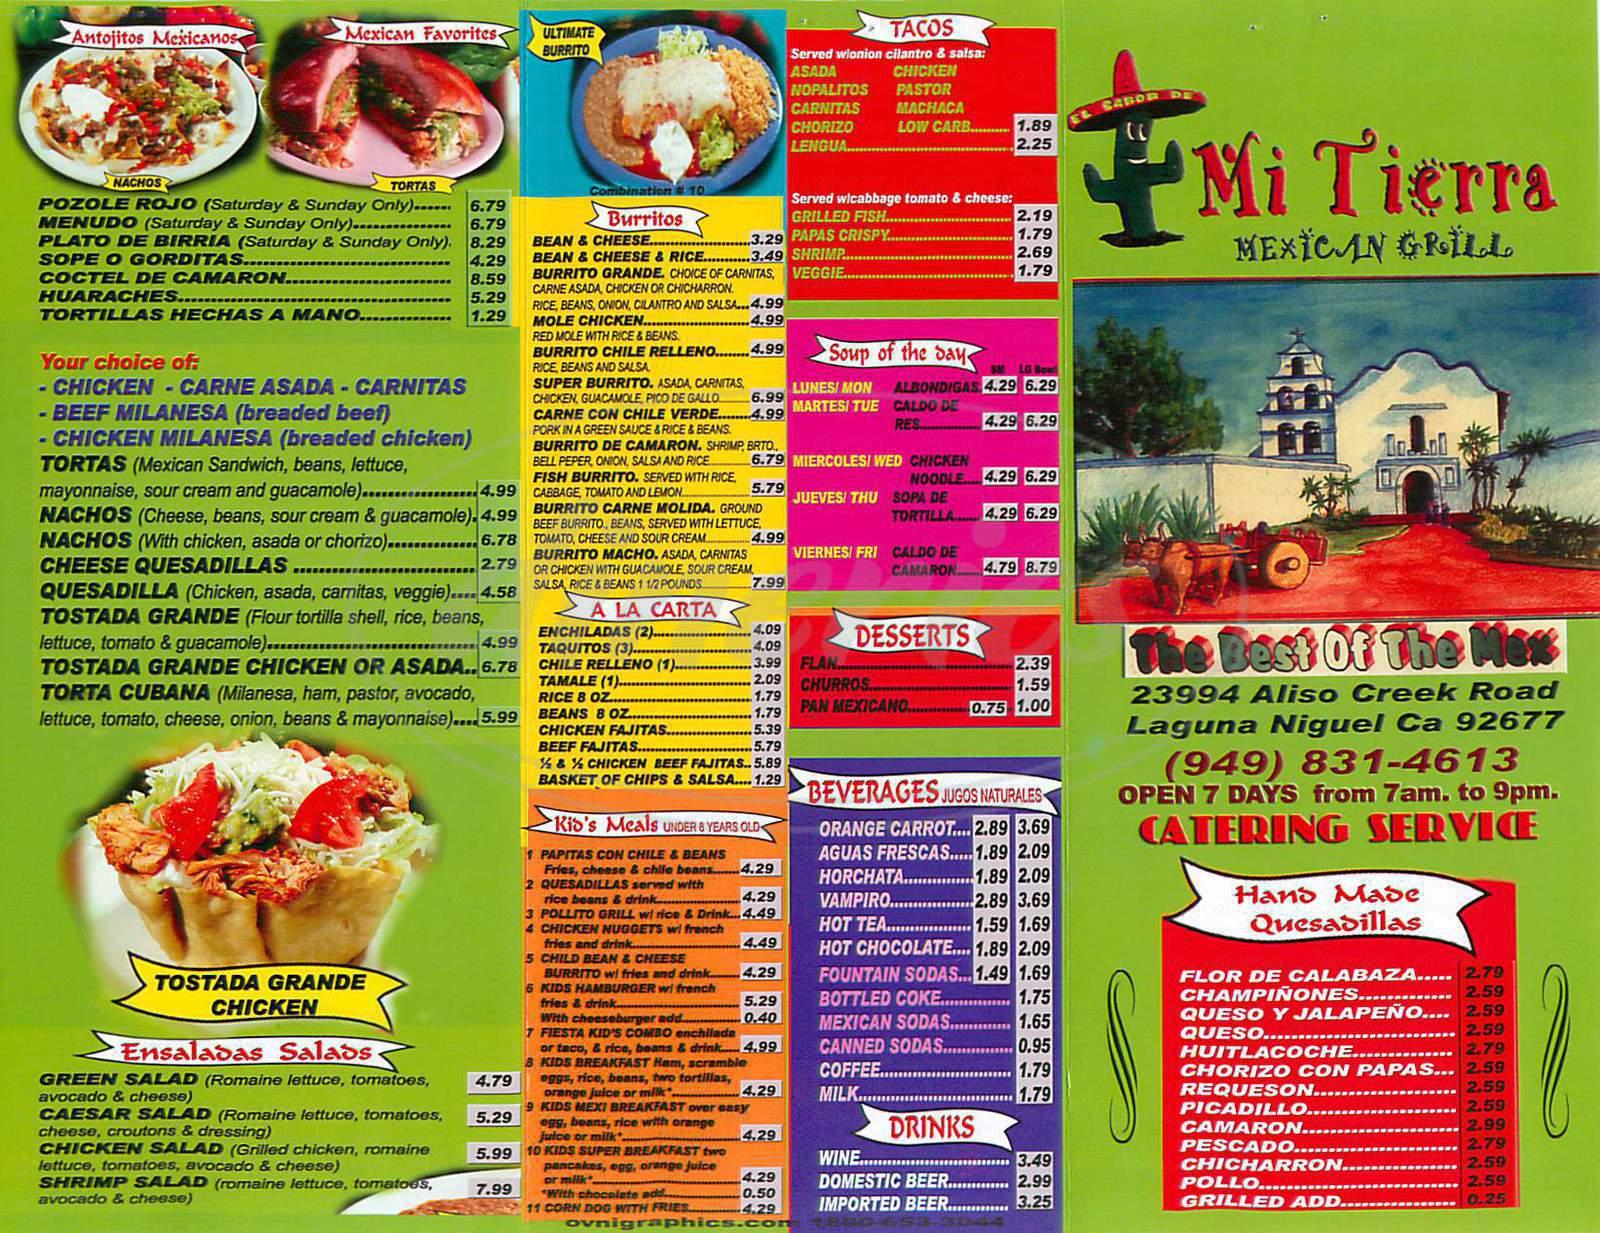 menu for Mi Tierra Mexican Grill